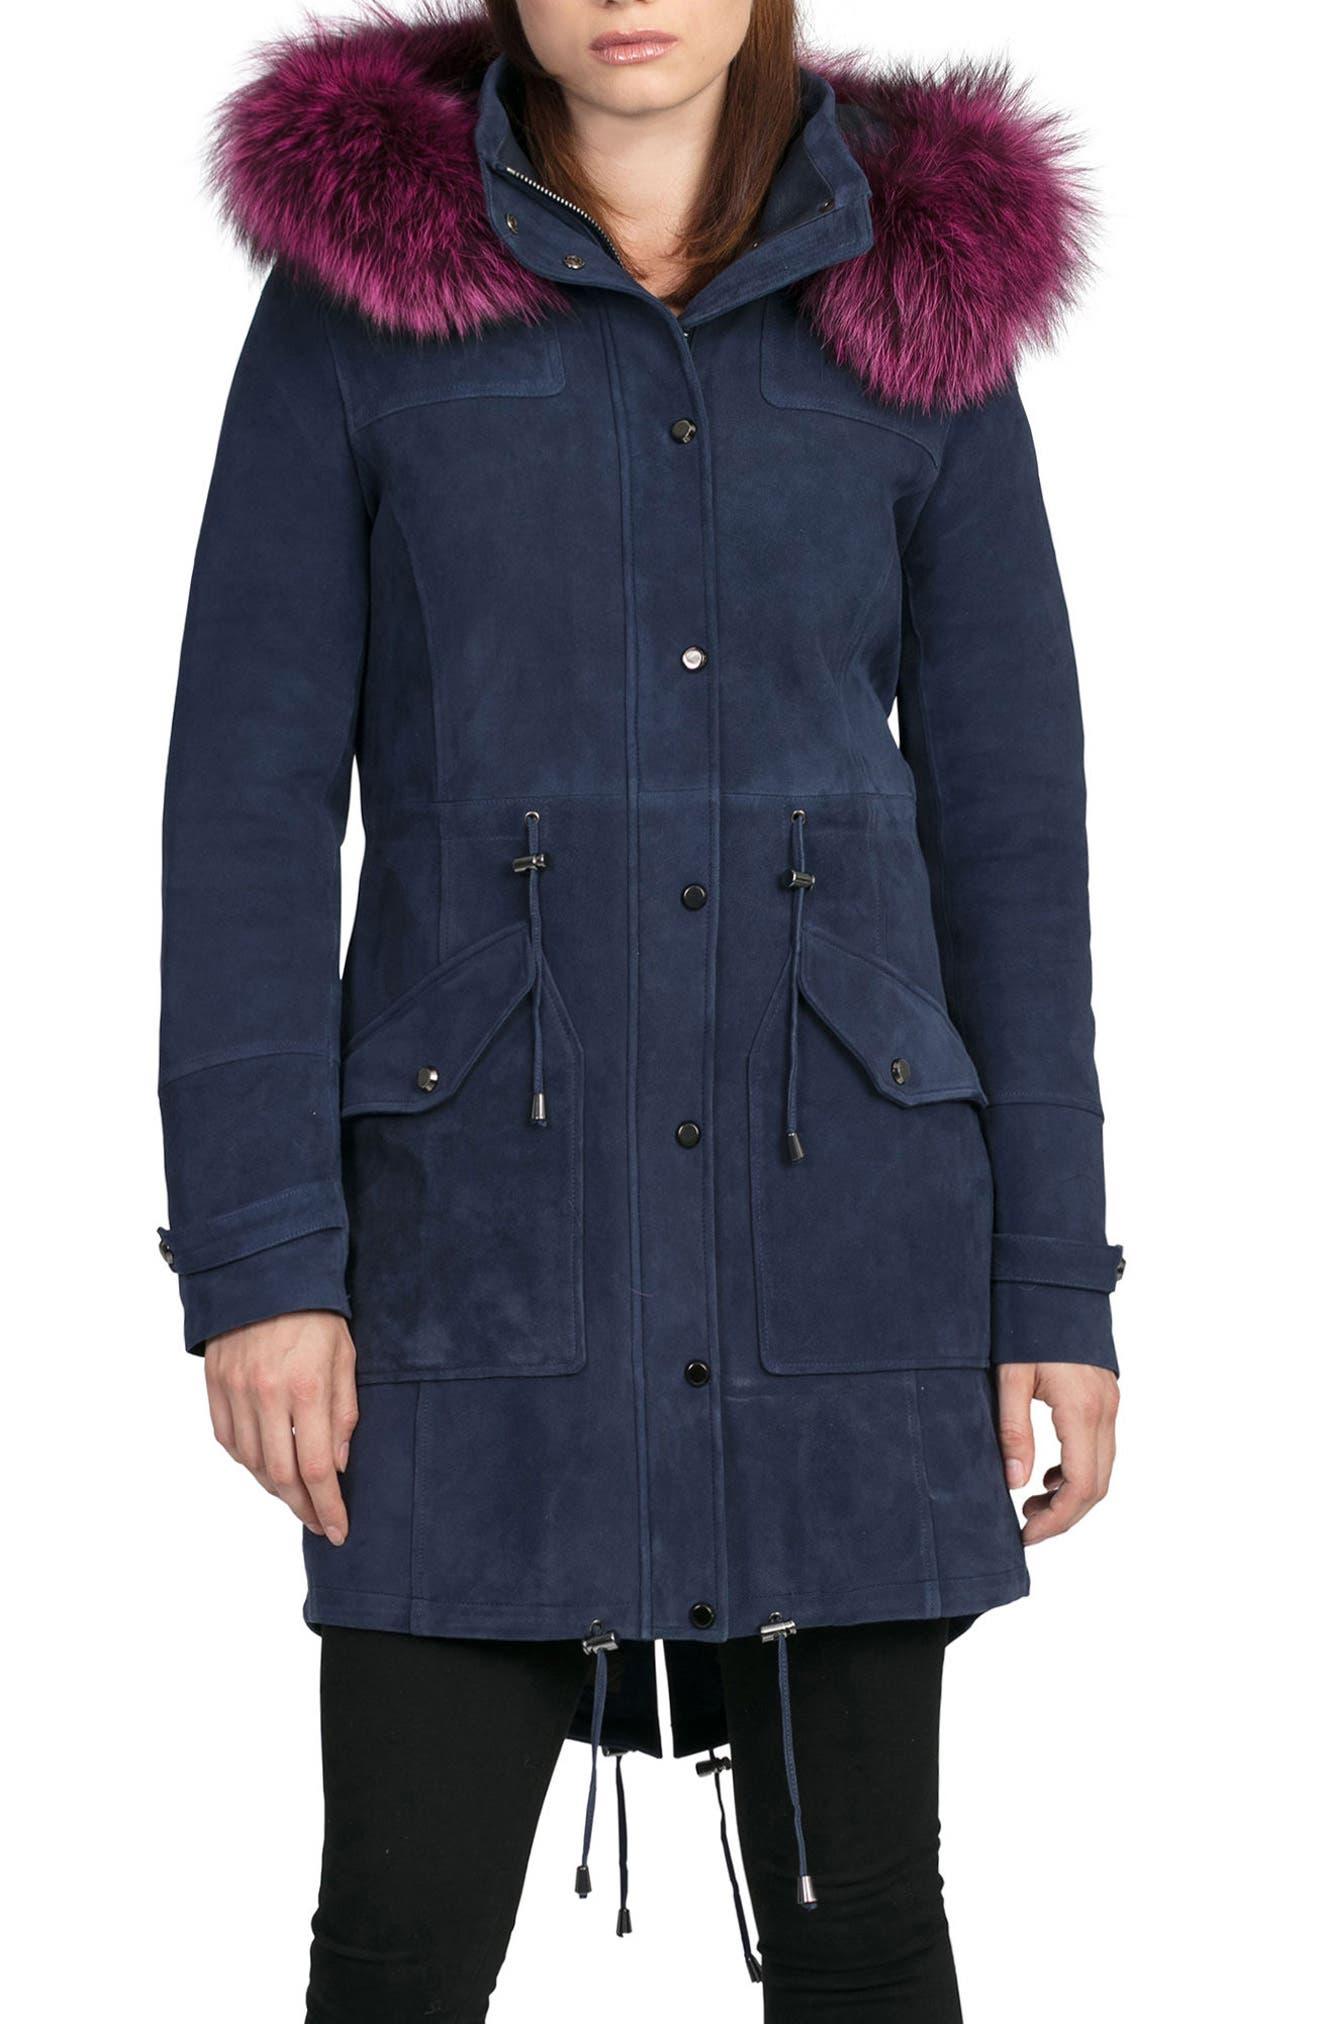 BAGATELLE.CITY The Parka Suede Coat with Genuine Fox Fur Trim